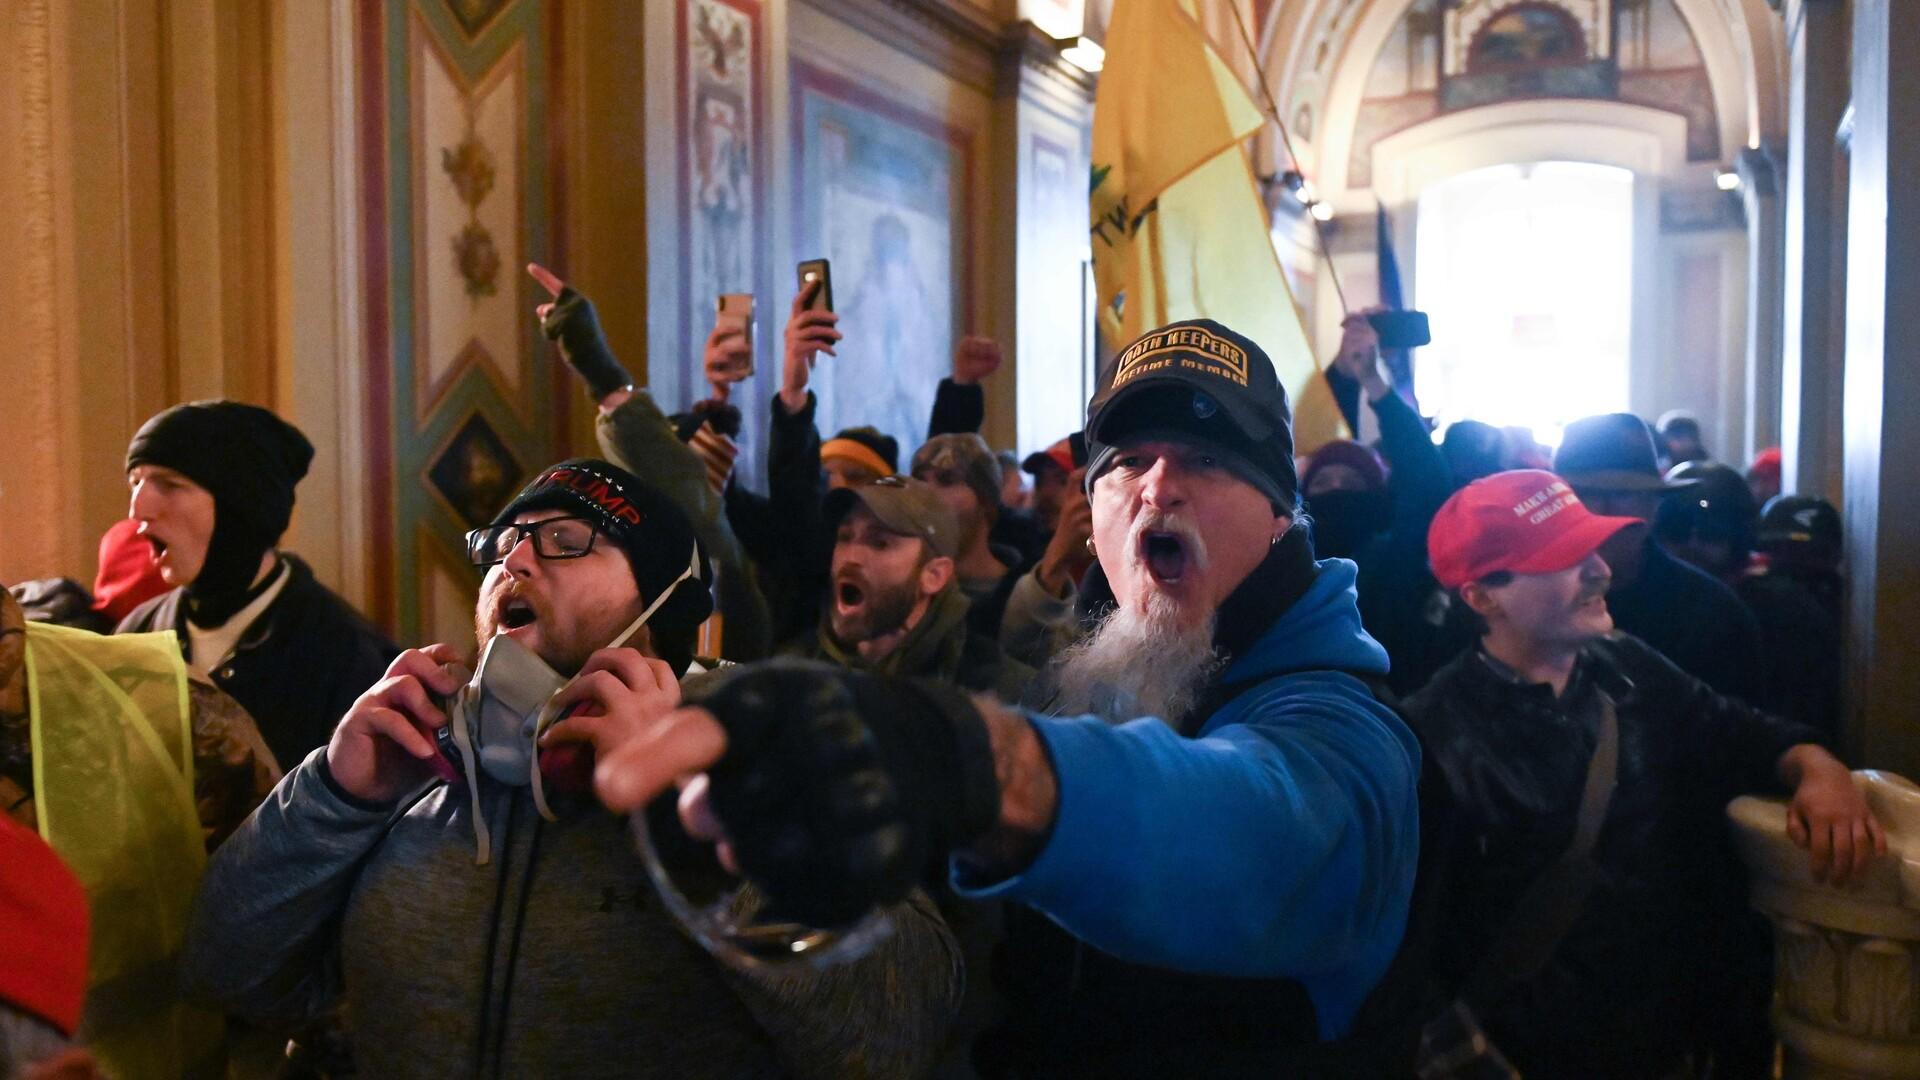 Kevin Loumann Eienstrand: Onsdagens angreb på Kongressen bliver kun starten på den amerikanske opstand